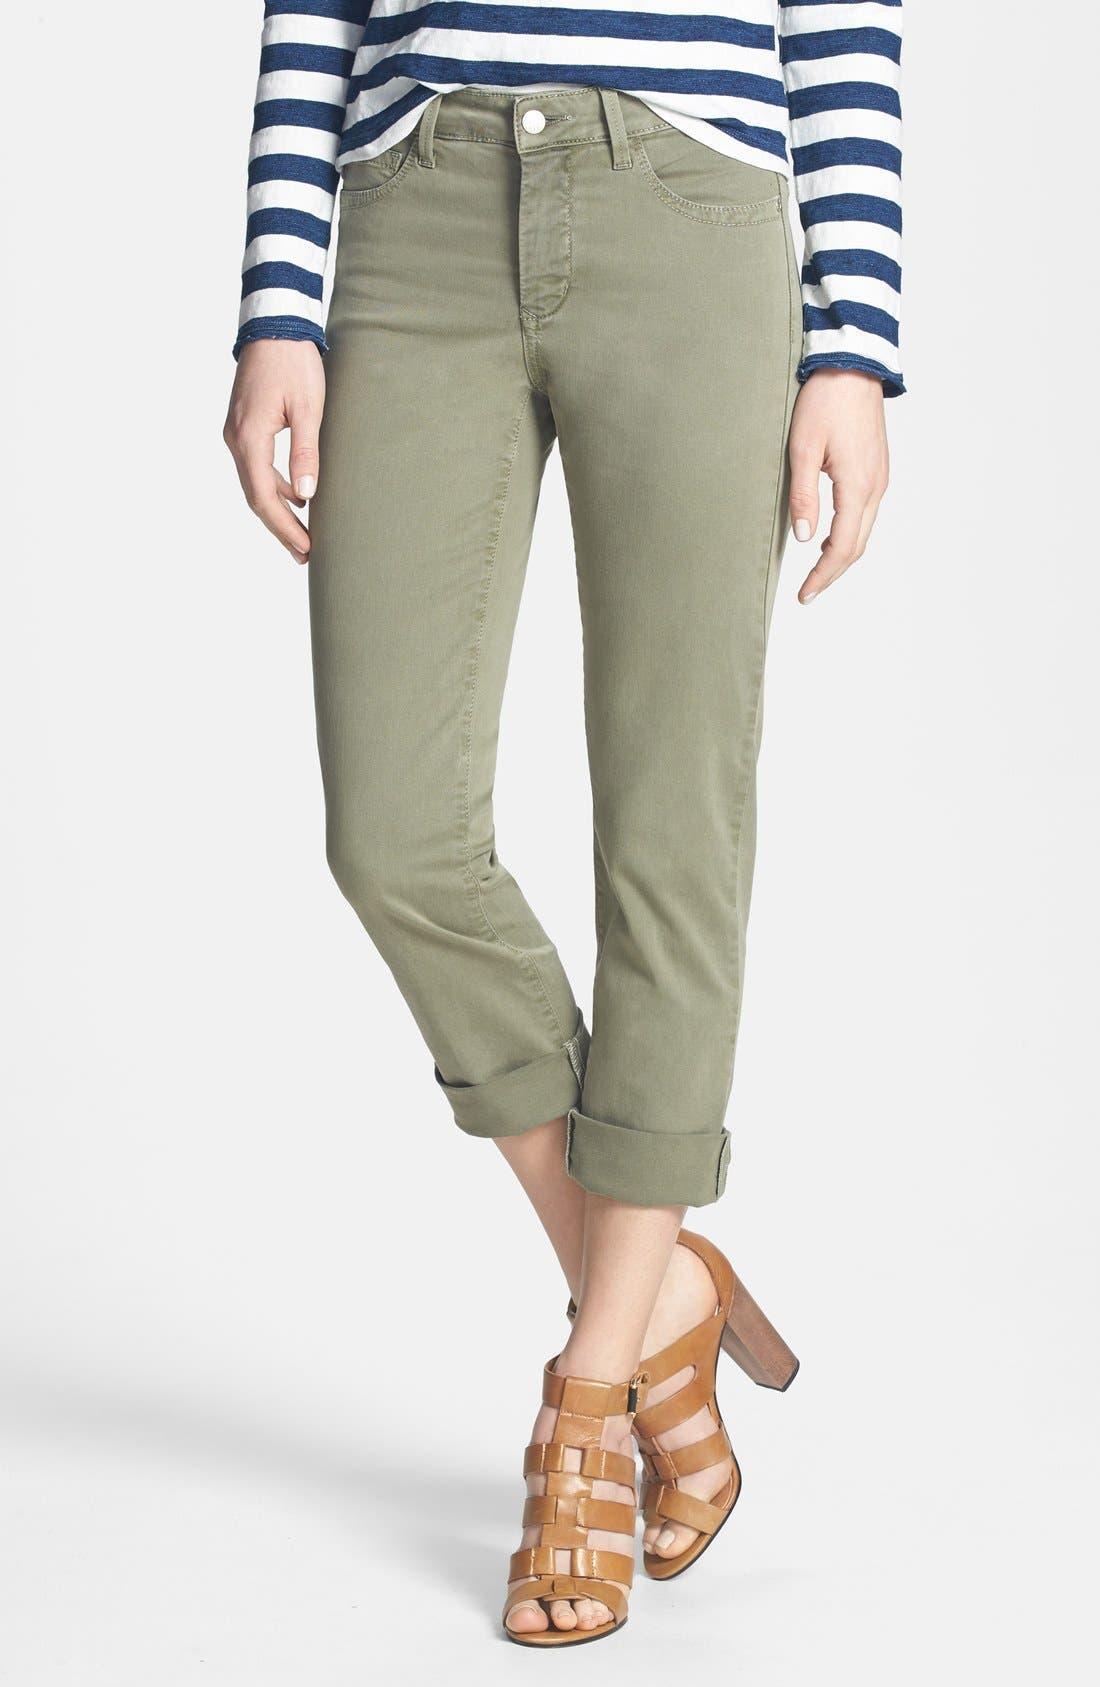 Alternate Image 1 Selected - NYDJ 'Bobbie' Stretch Boyfriend Jeans (Fennel) (Regular & Petite)